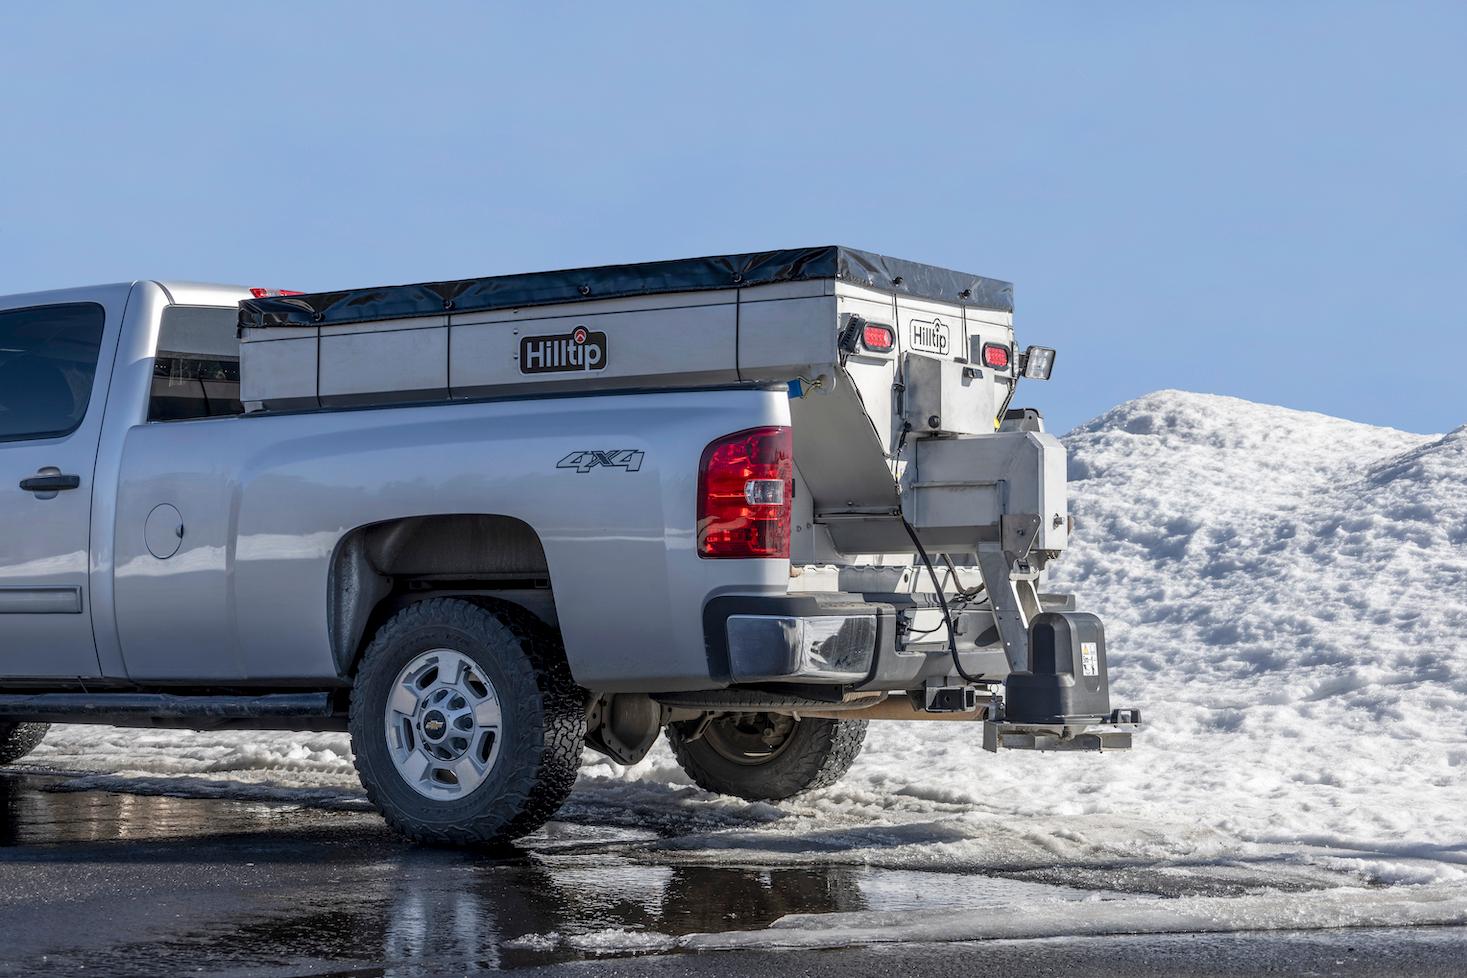 Hilltip salt spreader pickup truck